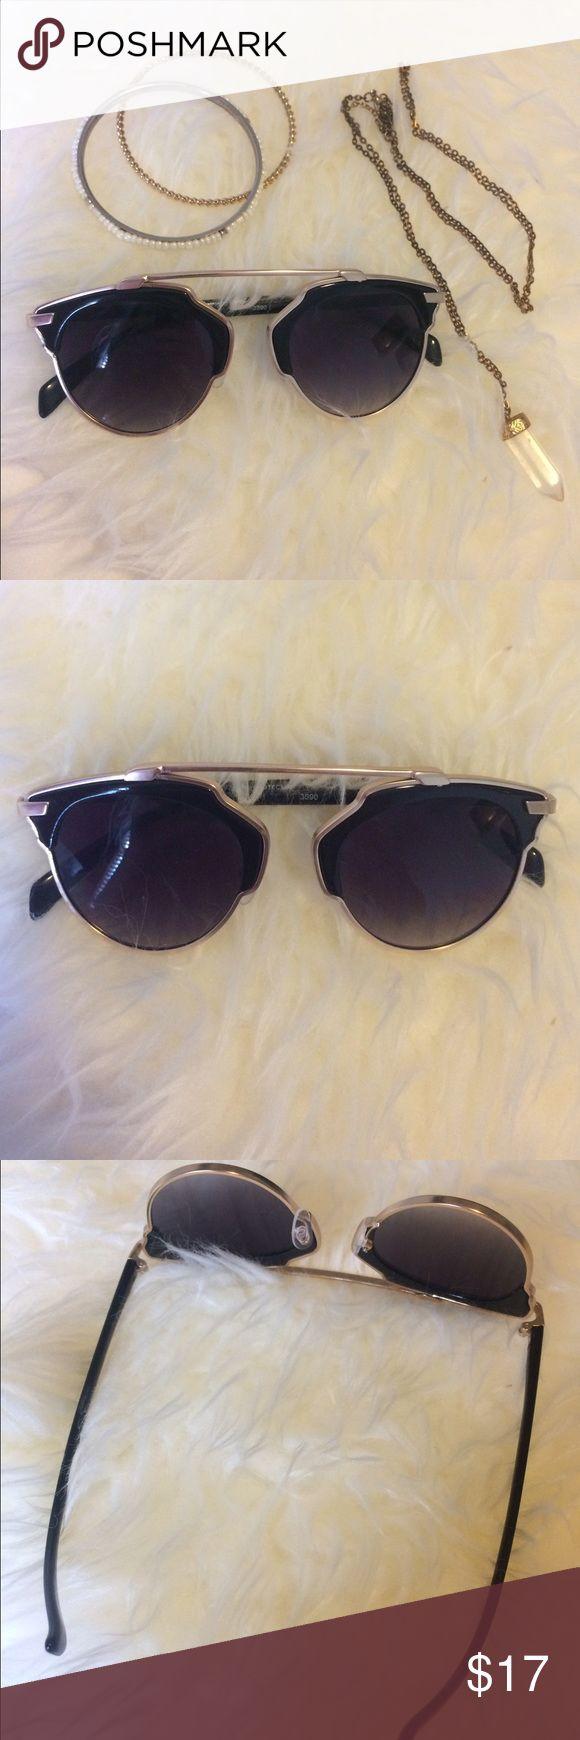 Rimless frame black and gold sunglasses Rimless frame black and gold sunglasses Accessories Glasses